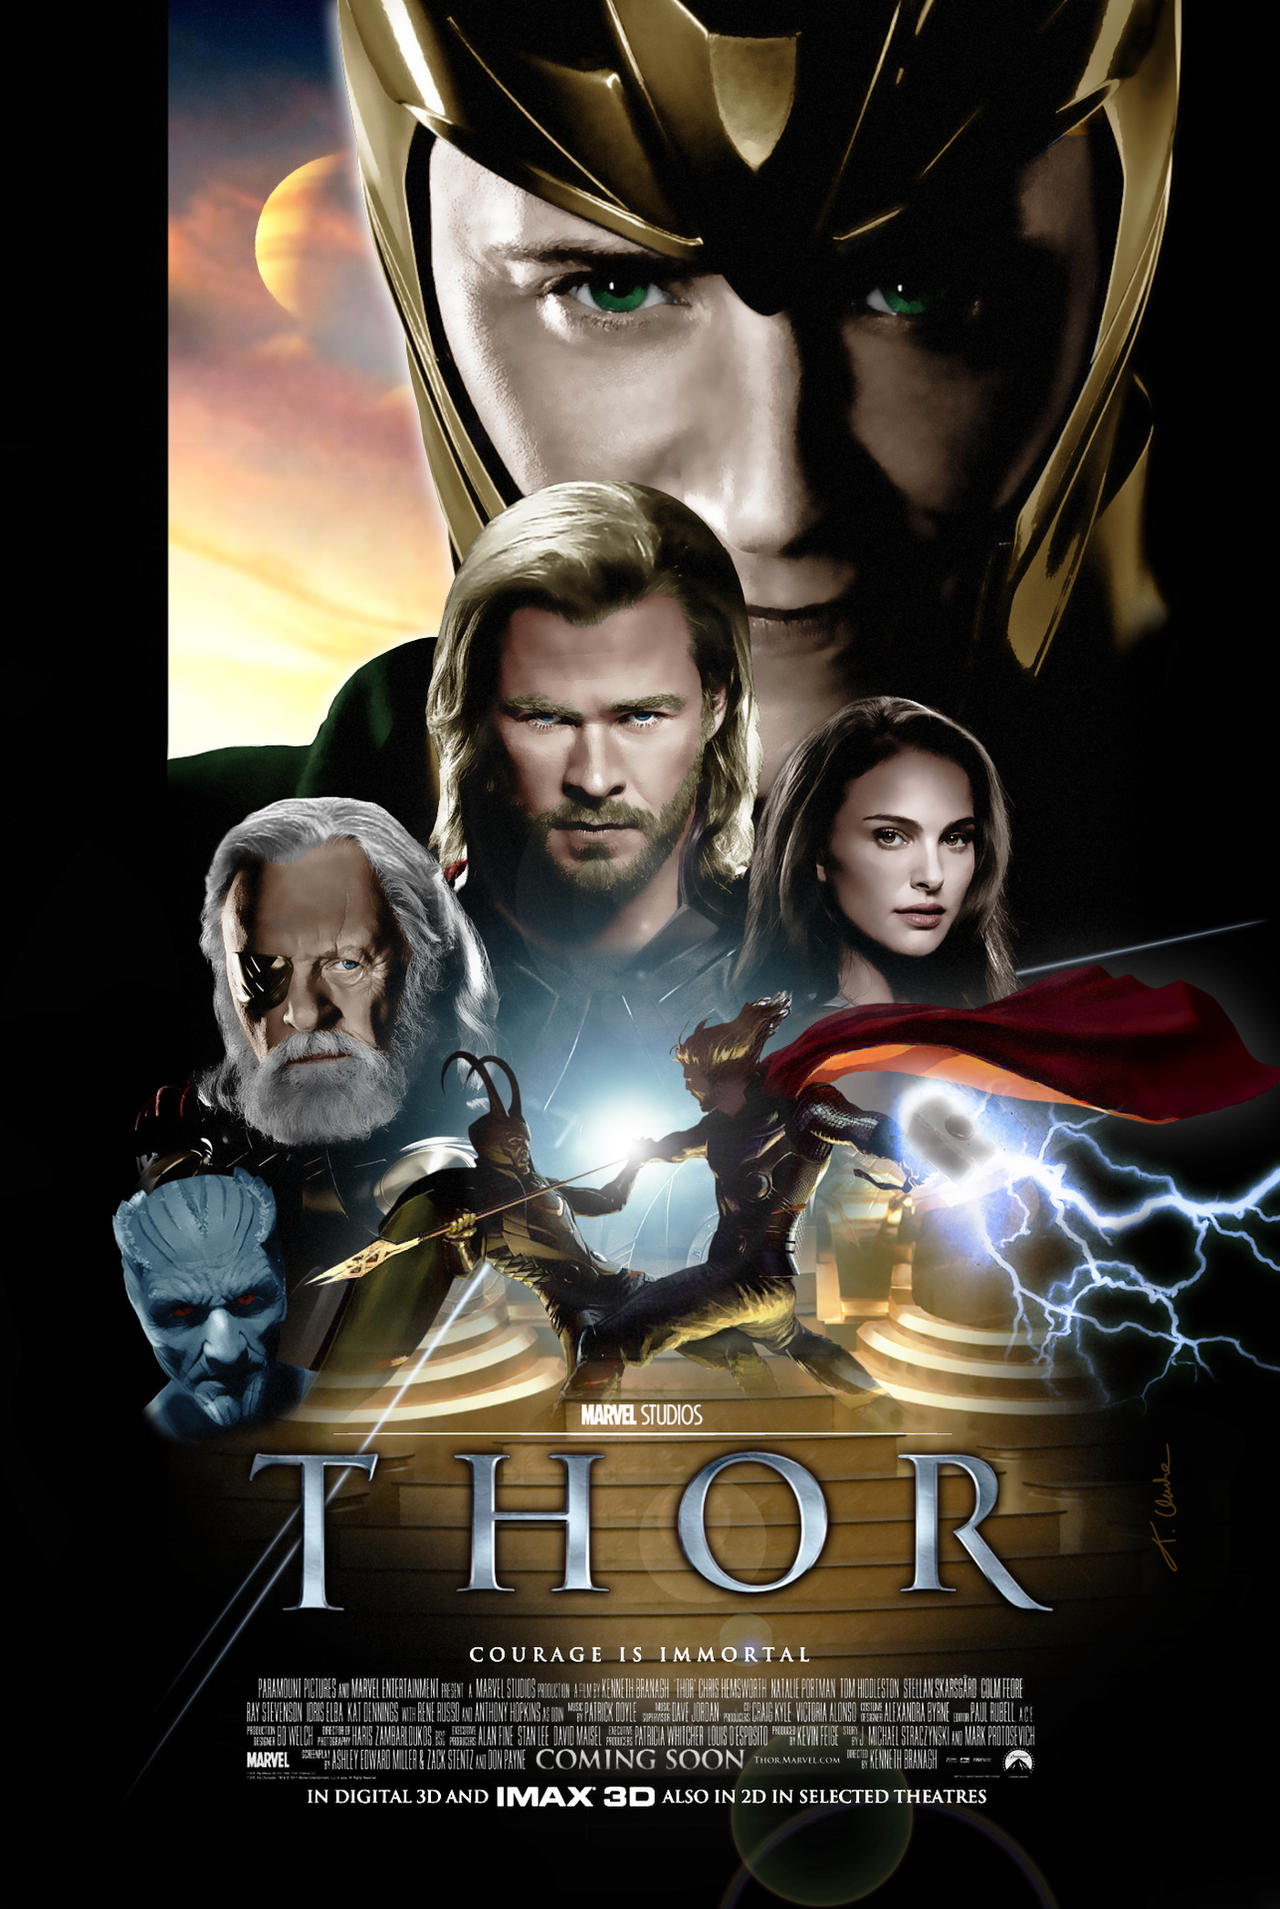 Drew Struzan Thor Poster by tclarke597 on DeviantArt